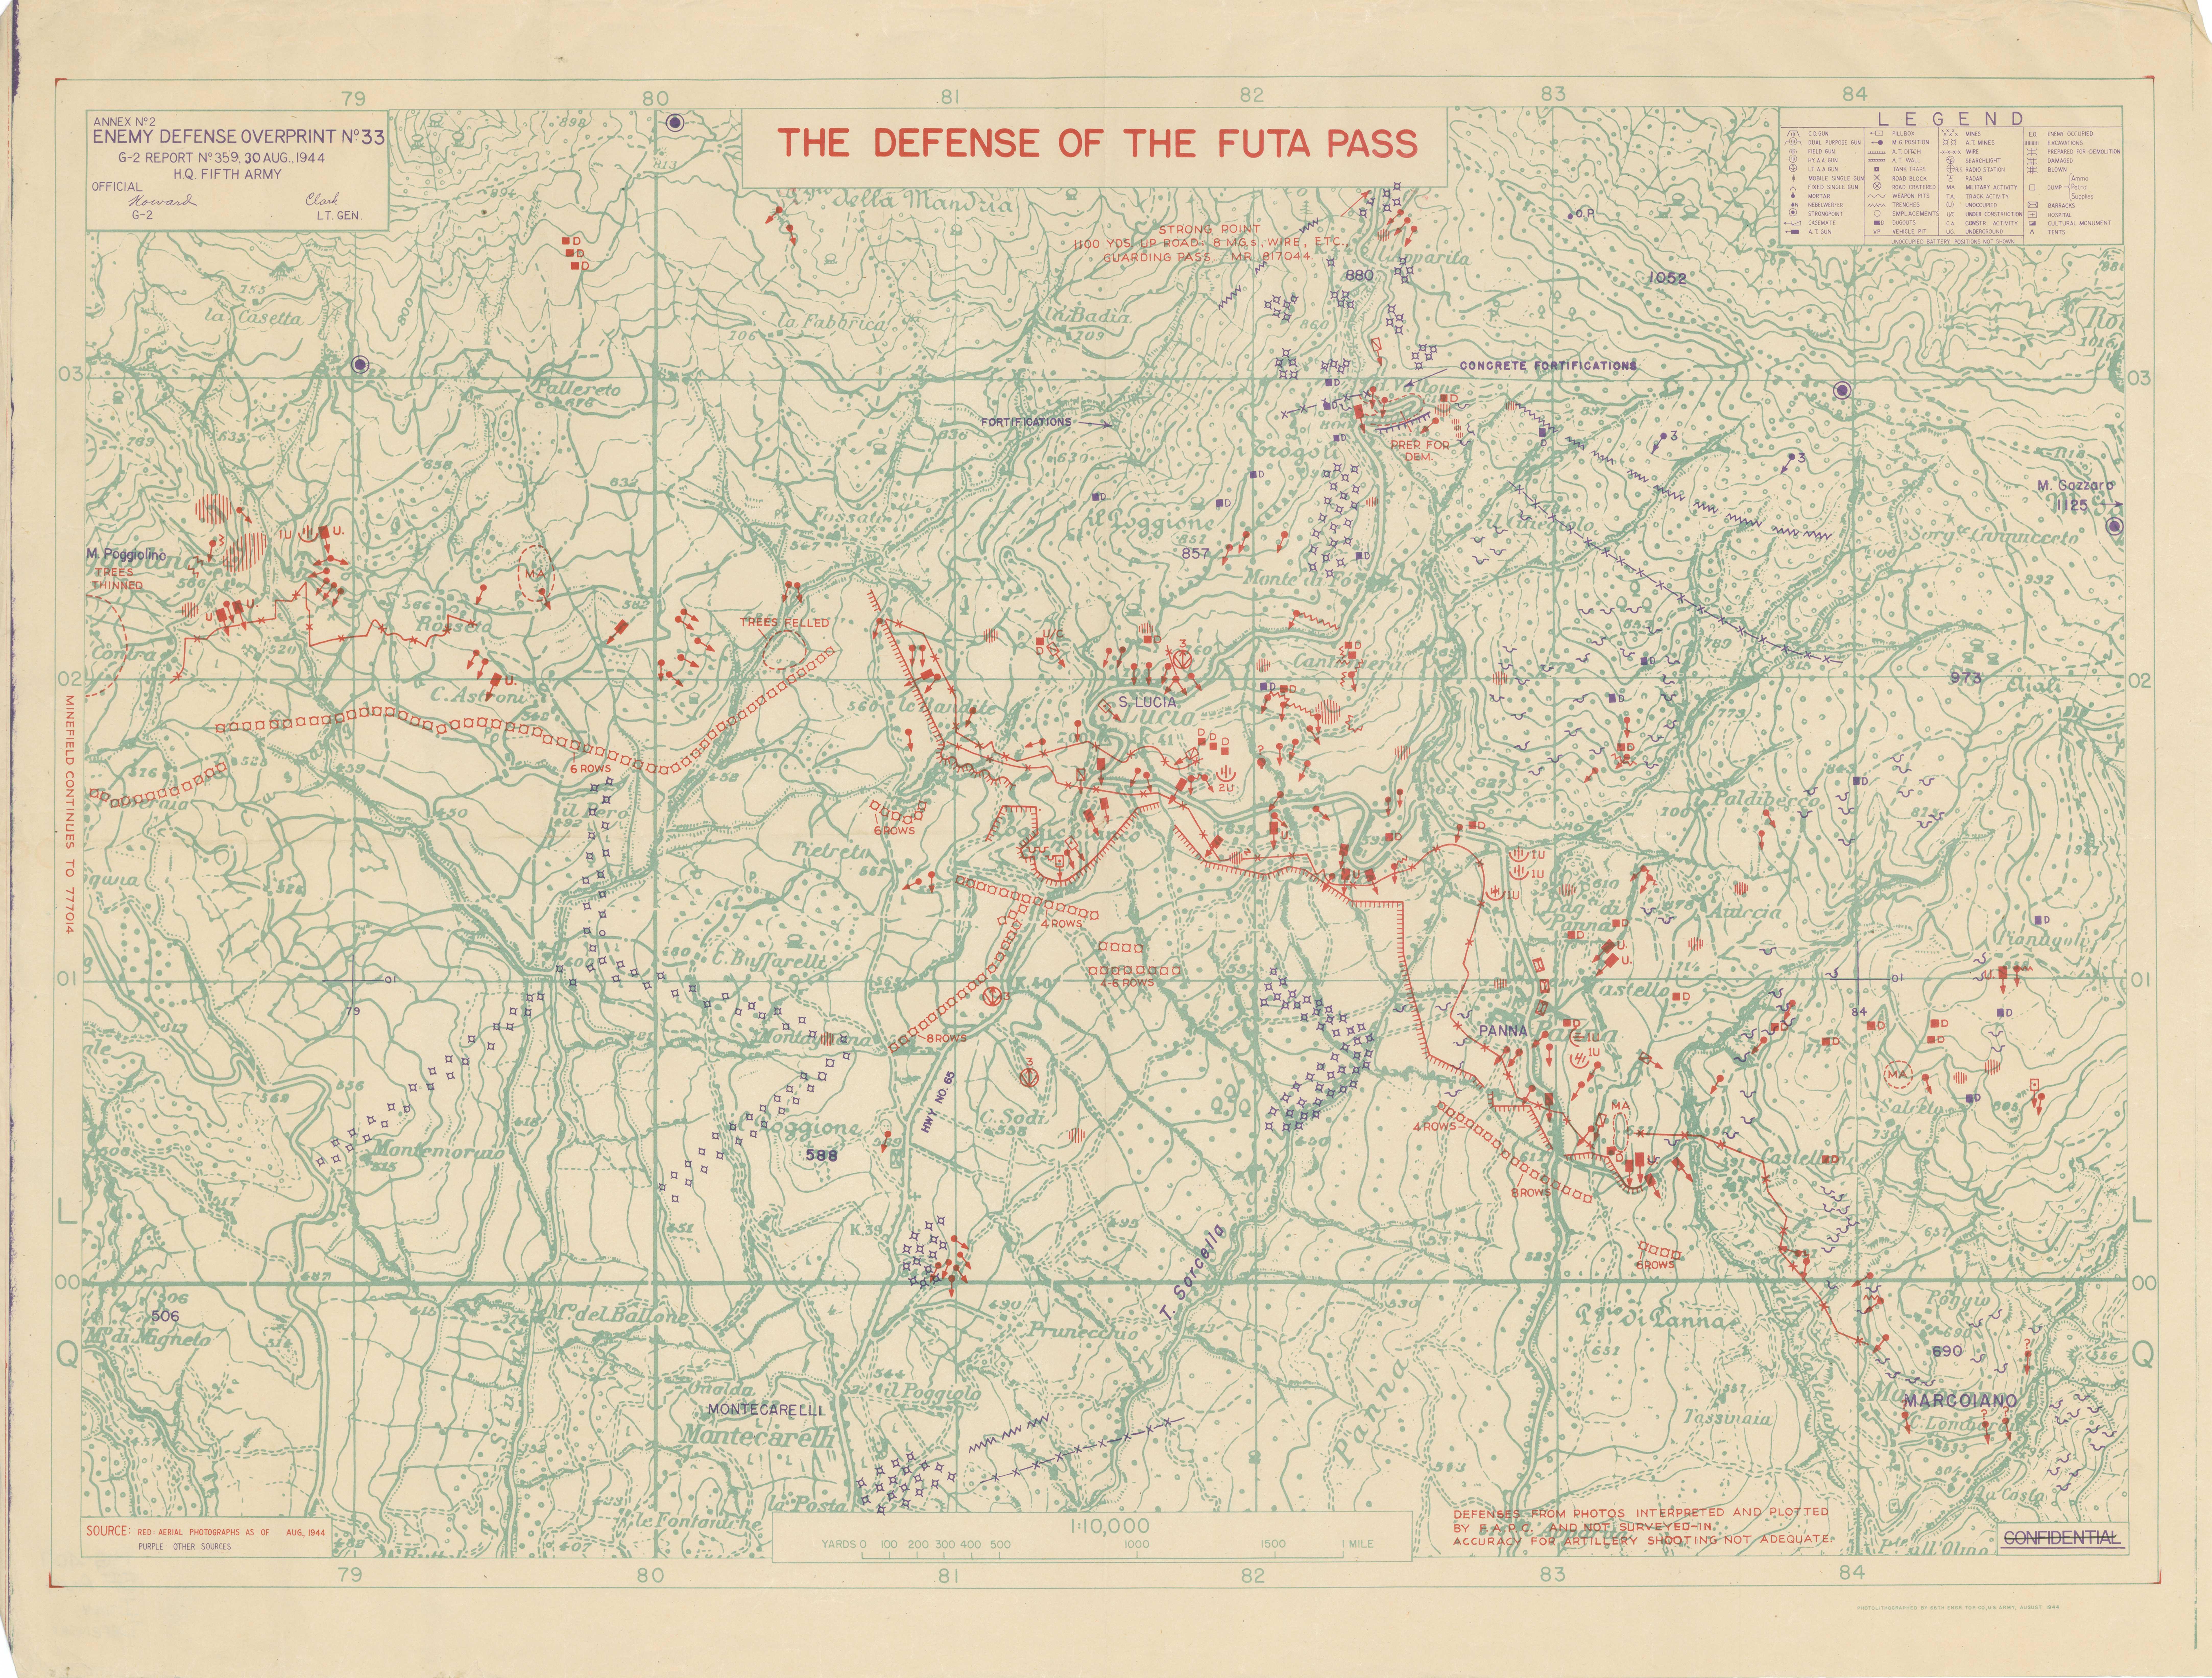 Enemy Defense Overprint No. 33 Defense of the Futa Pass